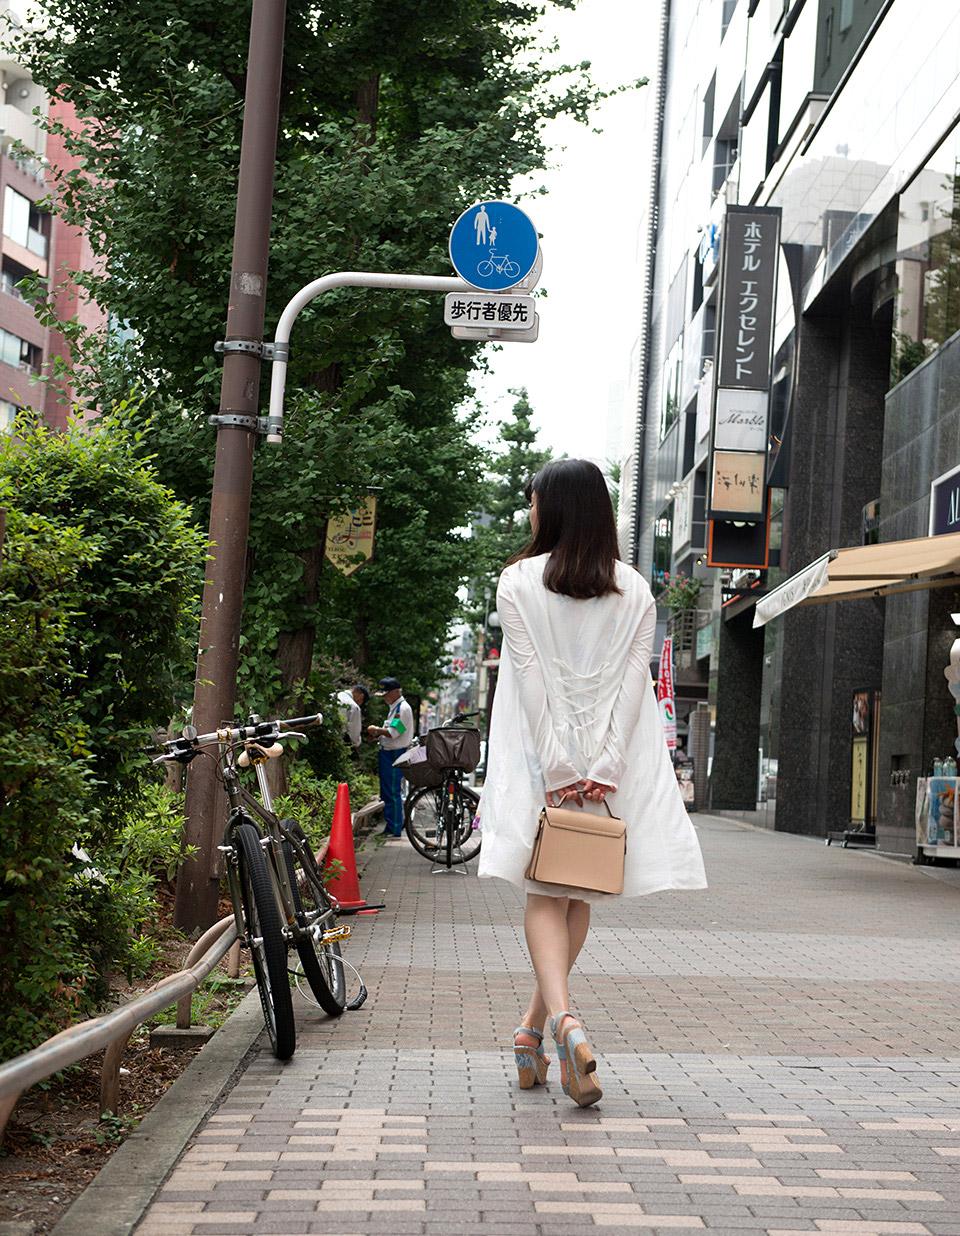 Tokyo tutor 2 uncensored 3